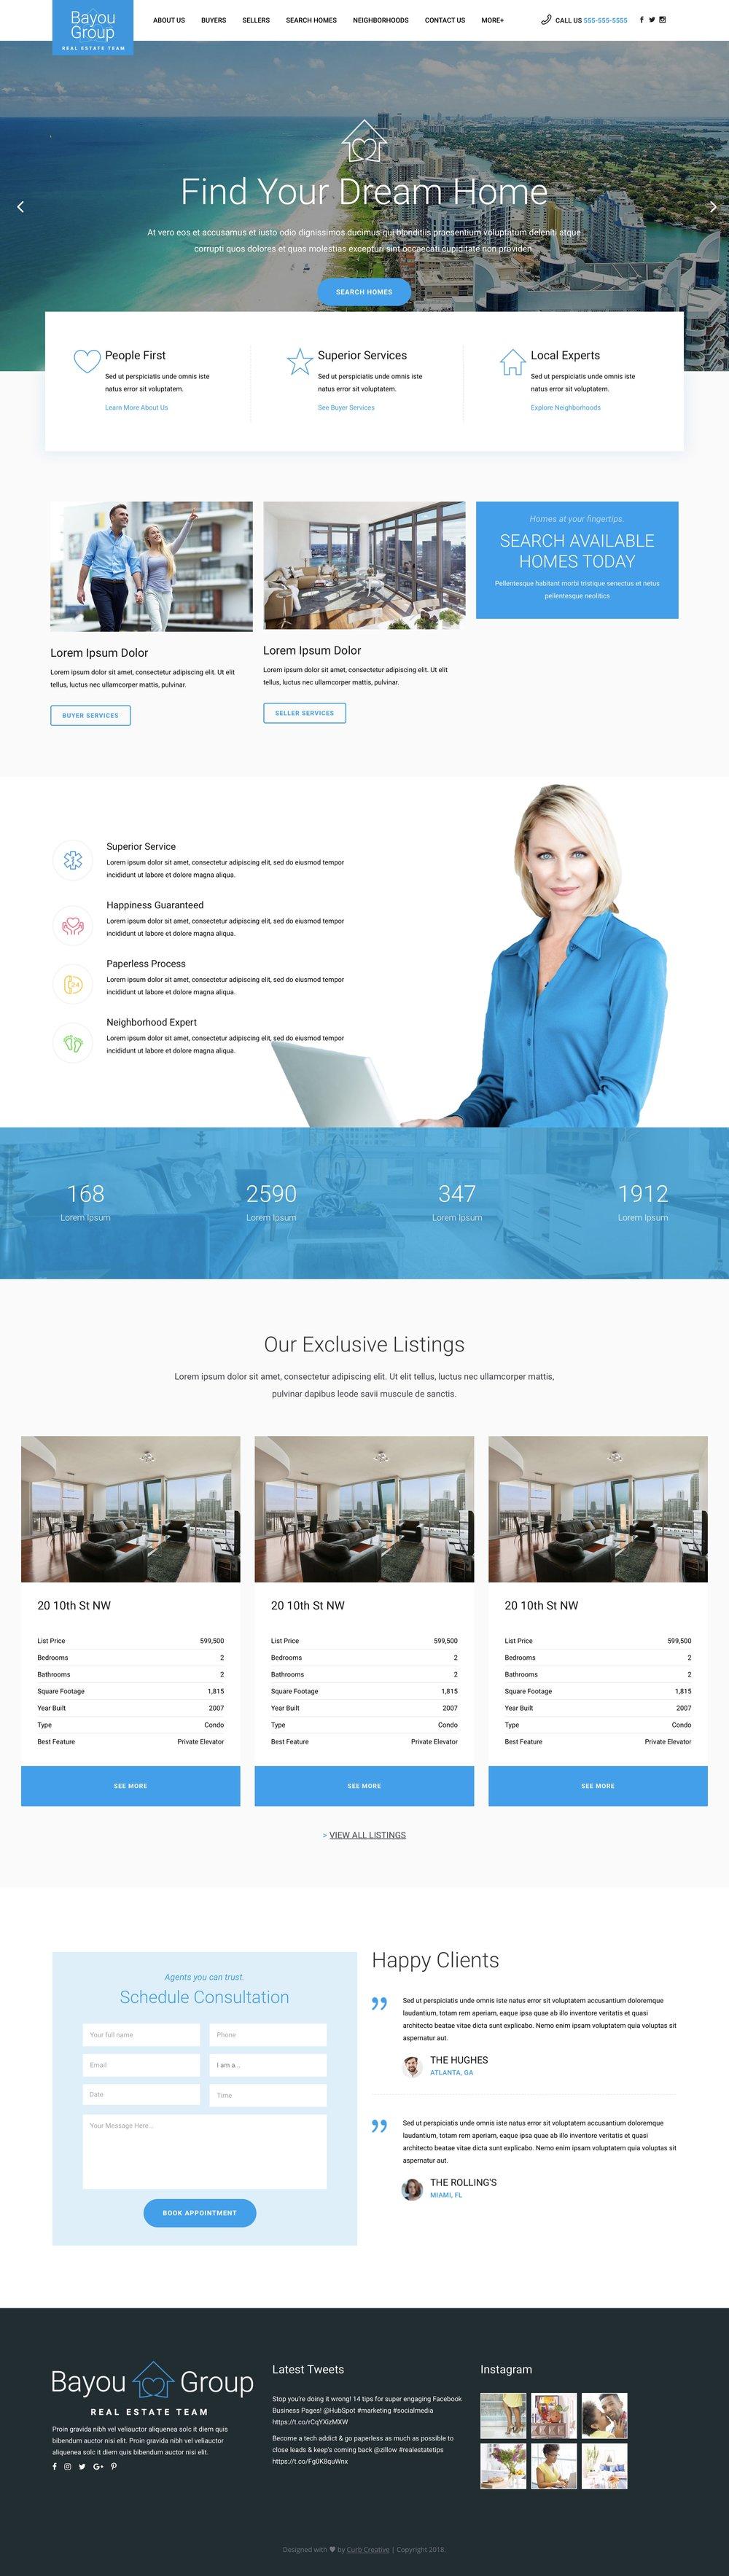 Real Estate Website_Bayou Theme.jpg